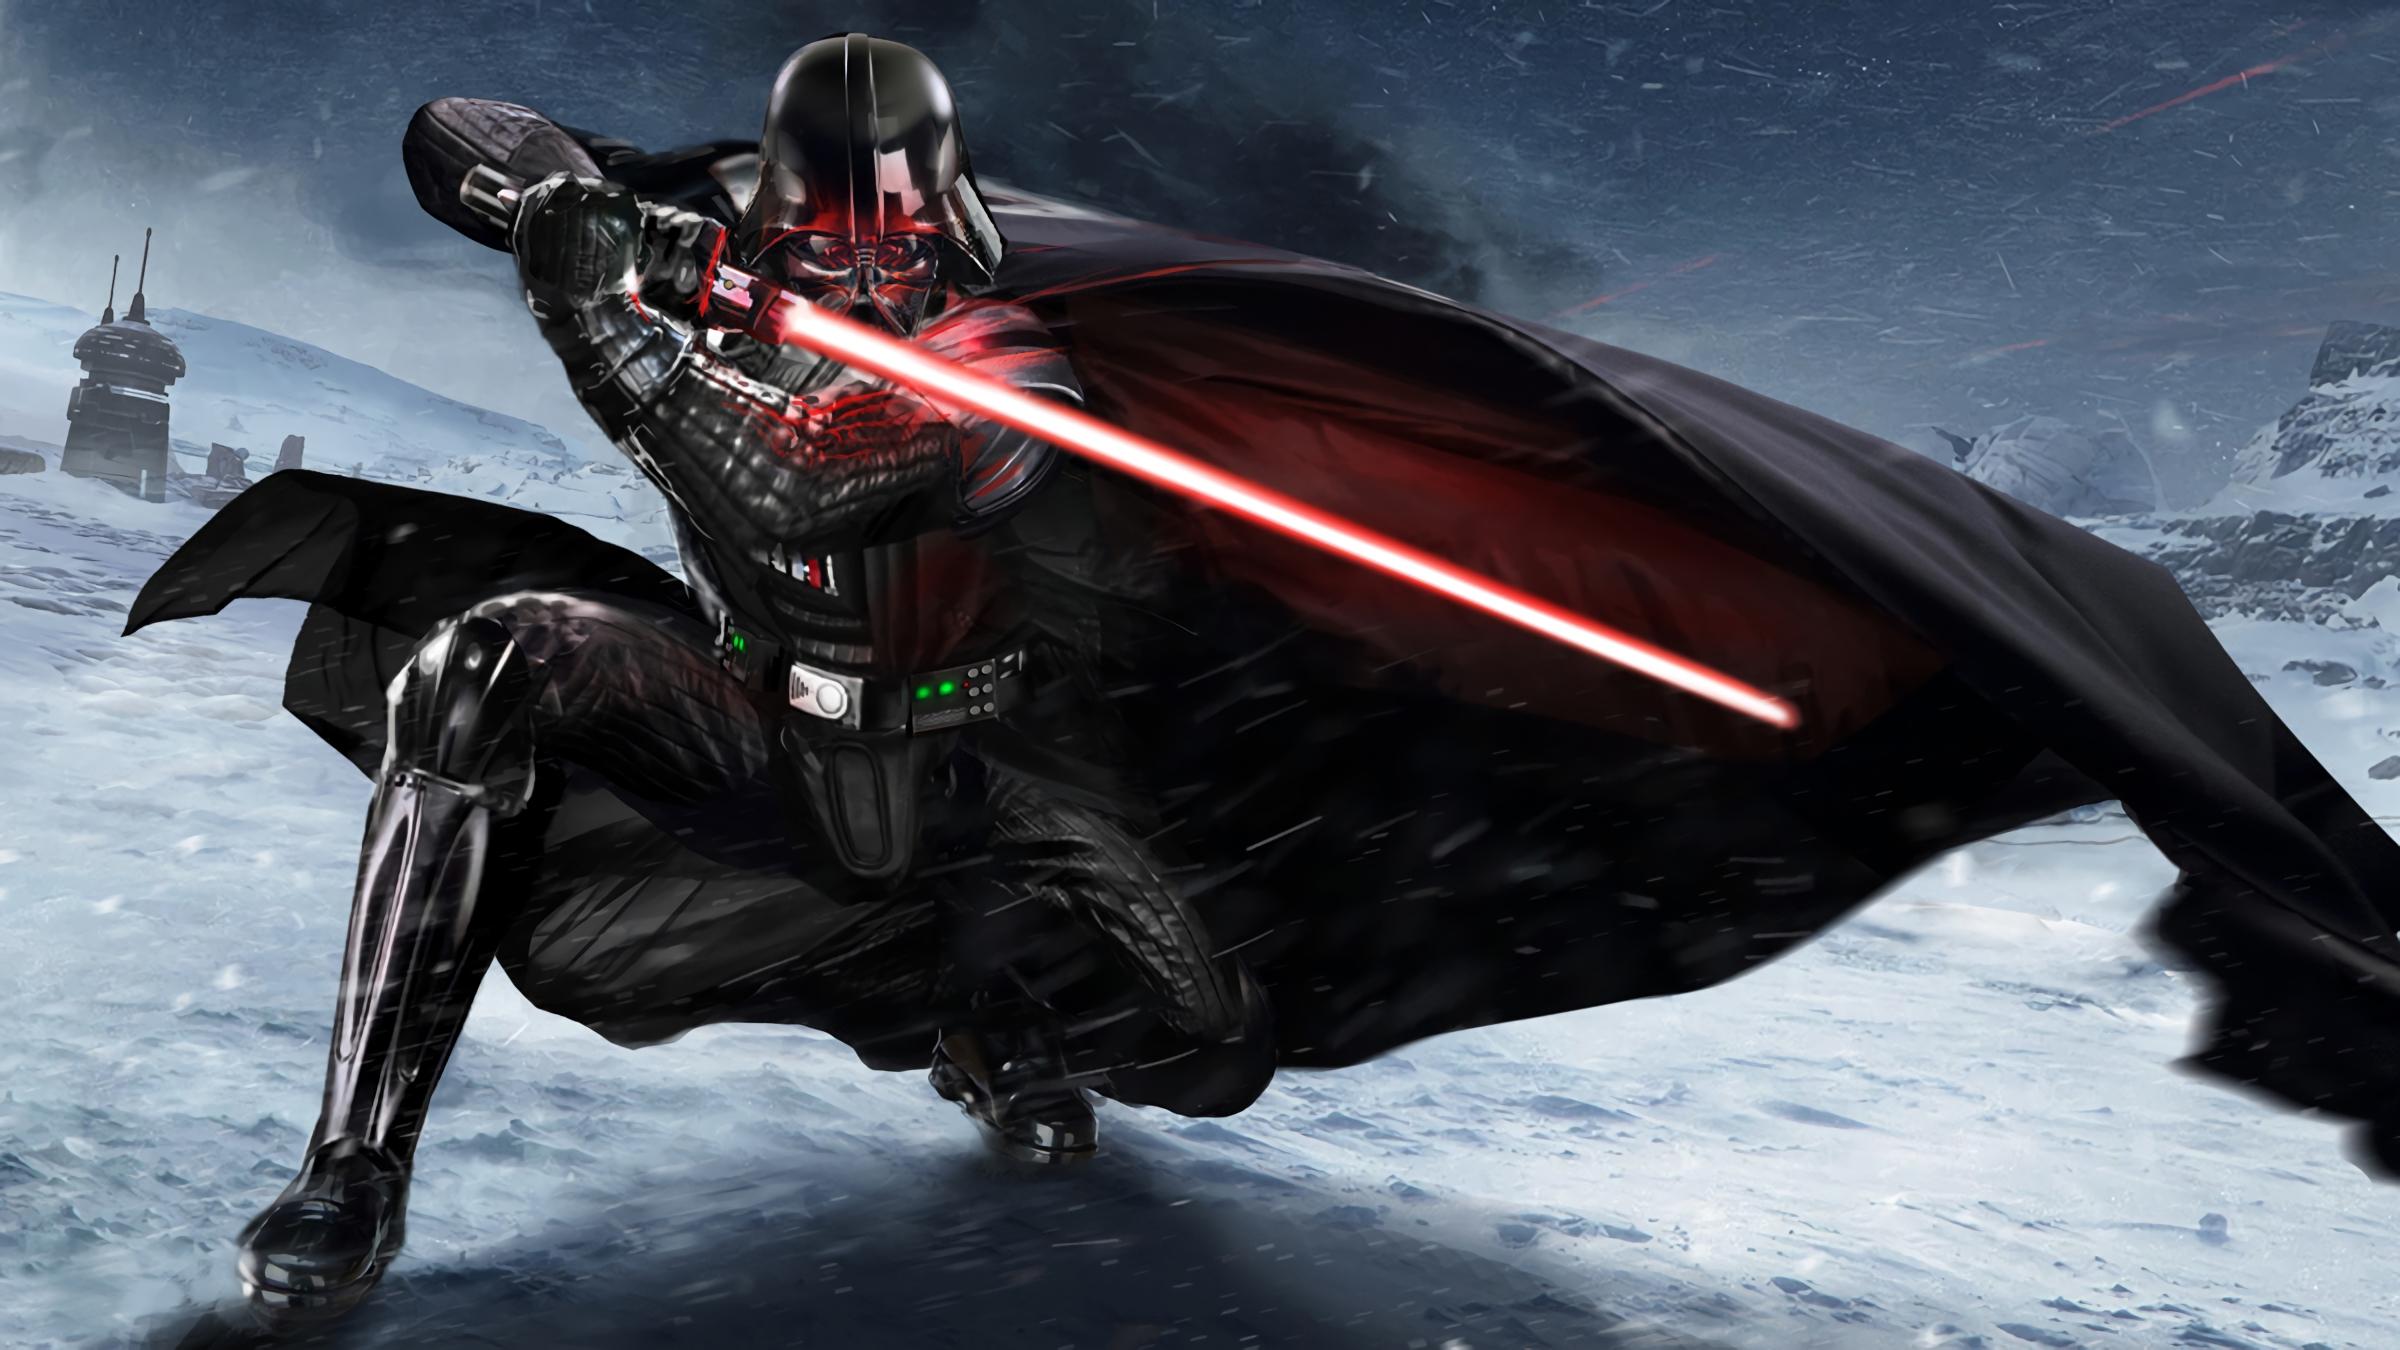 the great villain Darth Vader